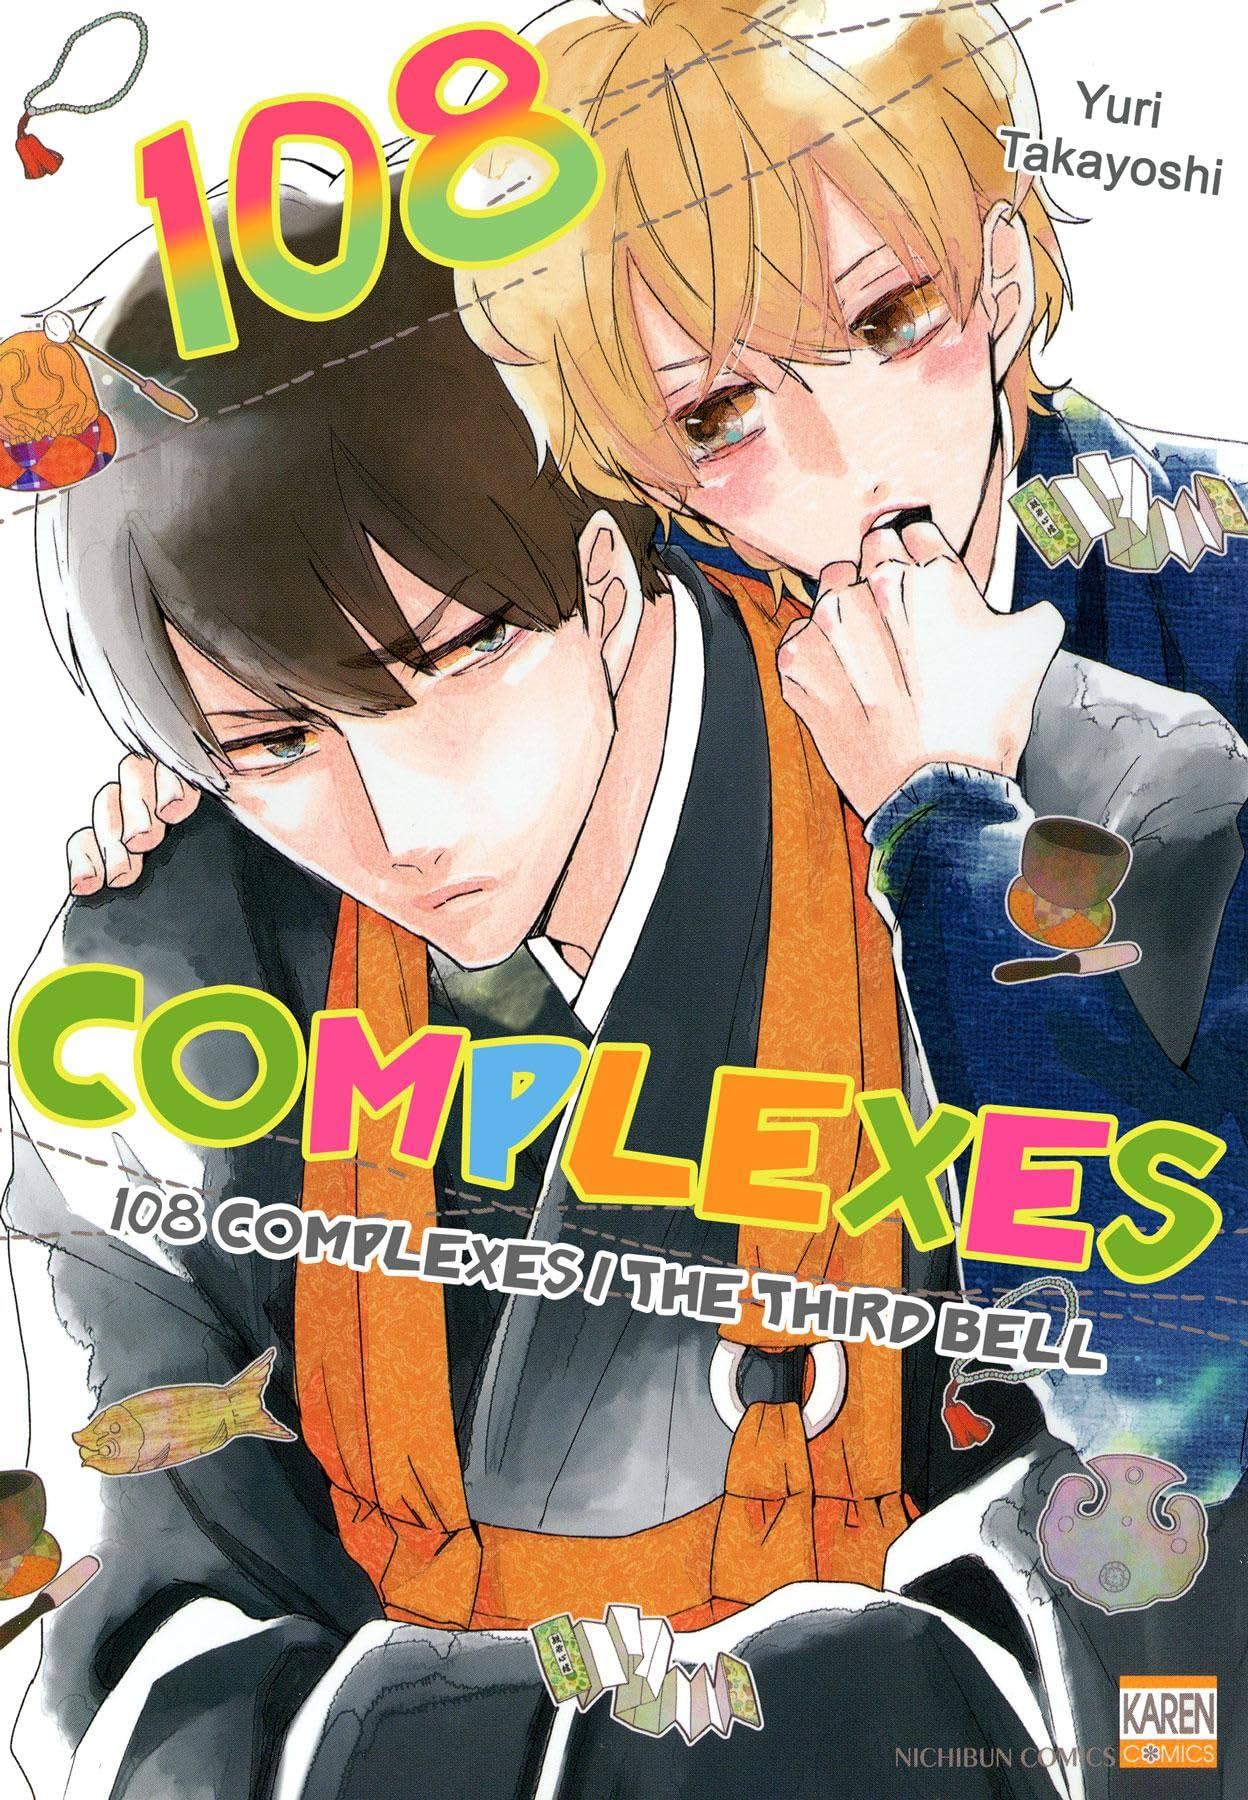 108 Complexes #3